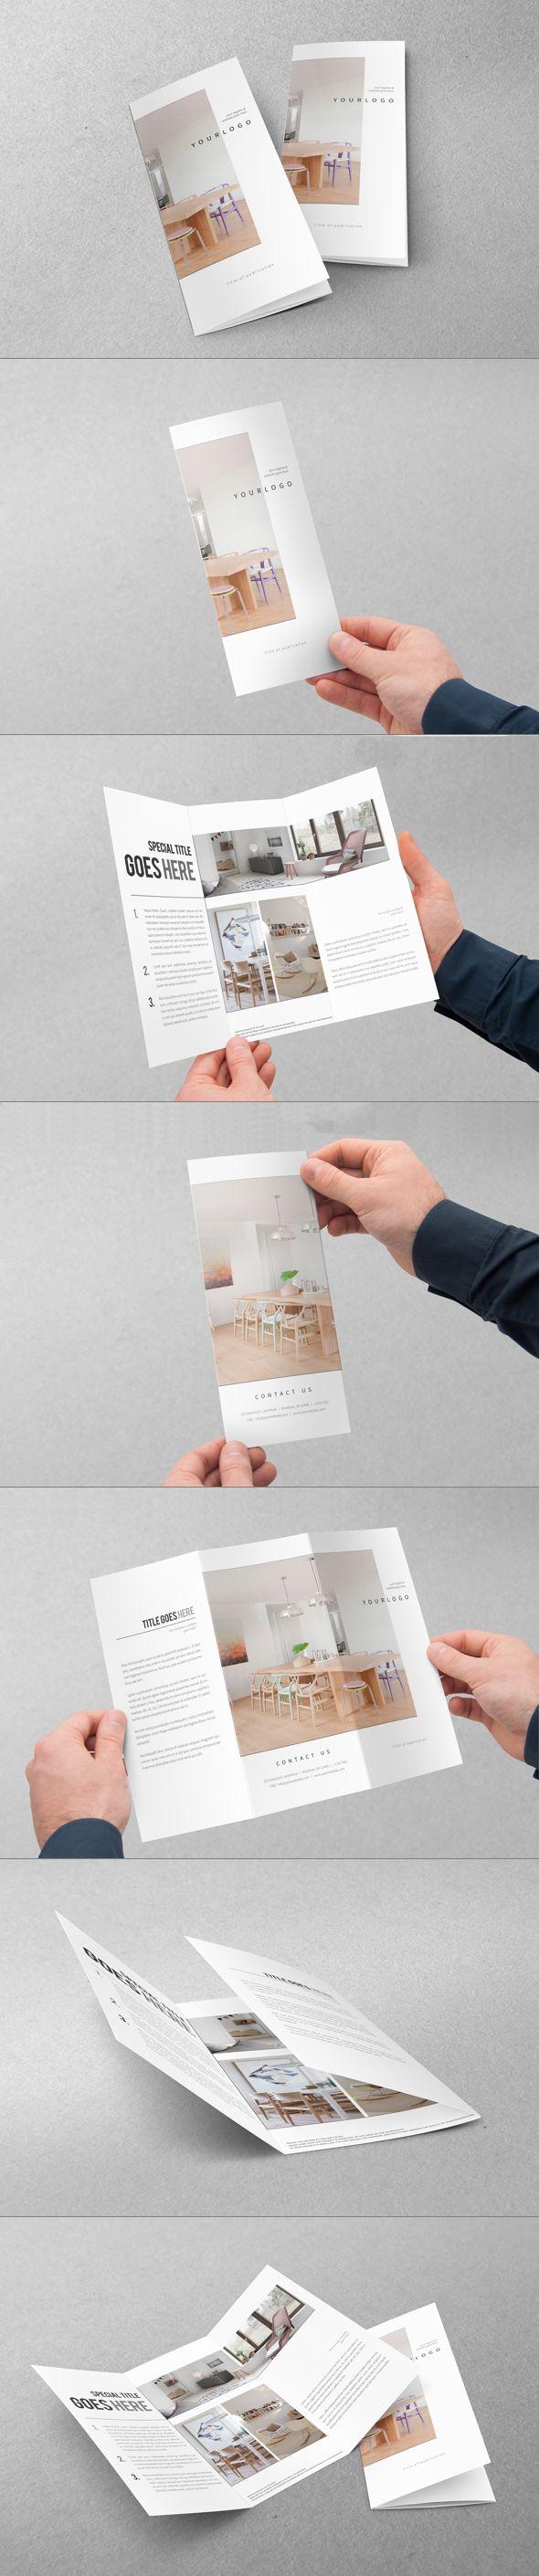 Minimal Interior Design Trifold on Behance